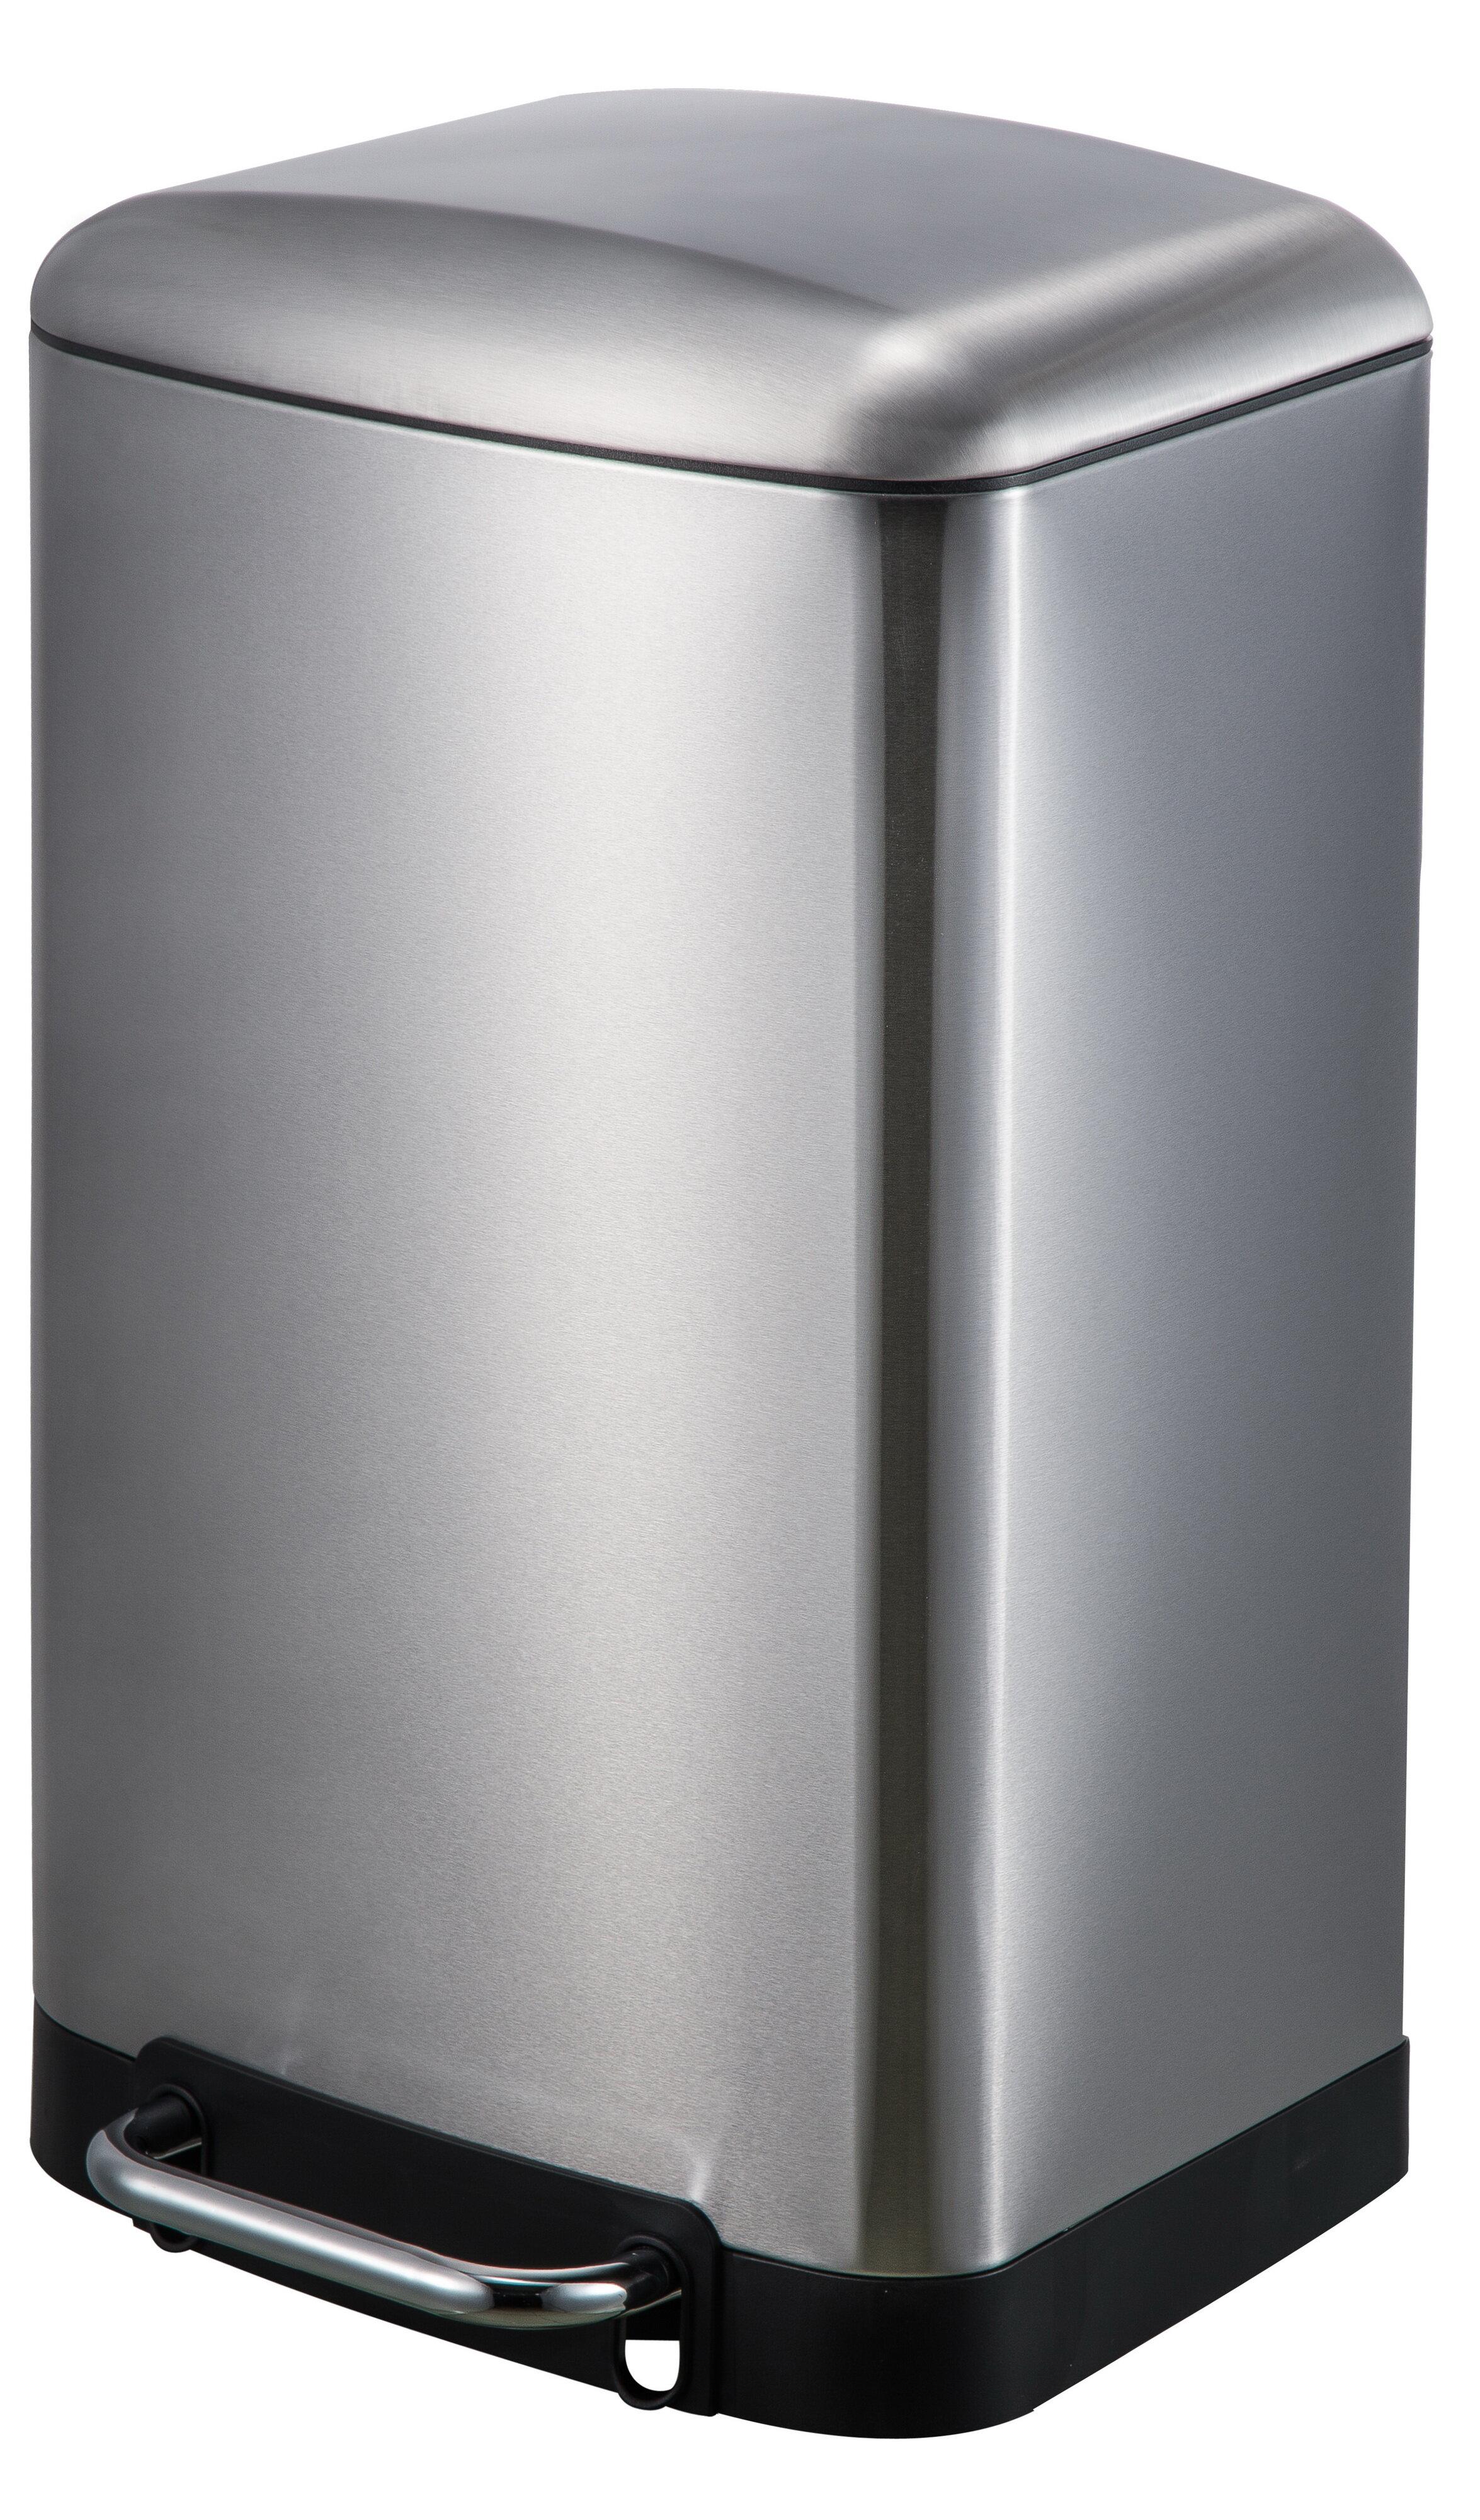 JoyWare Stainless Steel 8 Gallon Step On Trash Can & Reviews | Wayfair